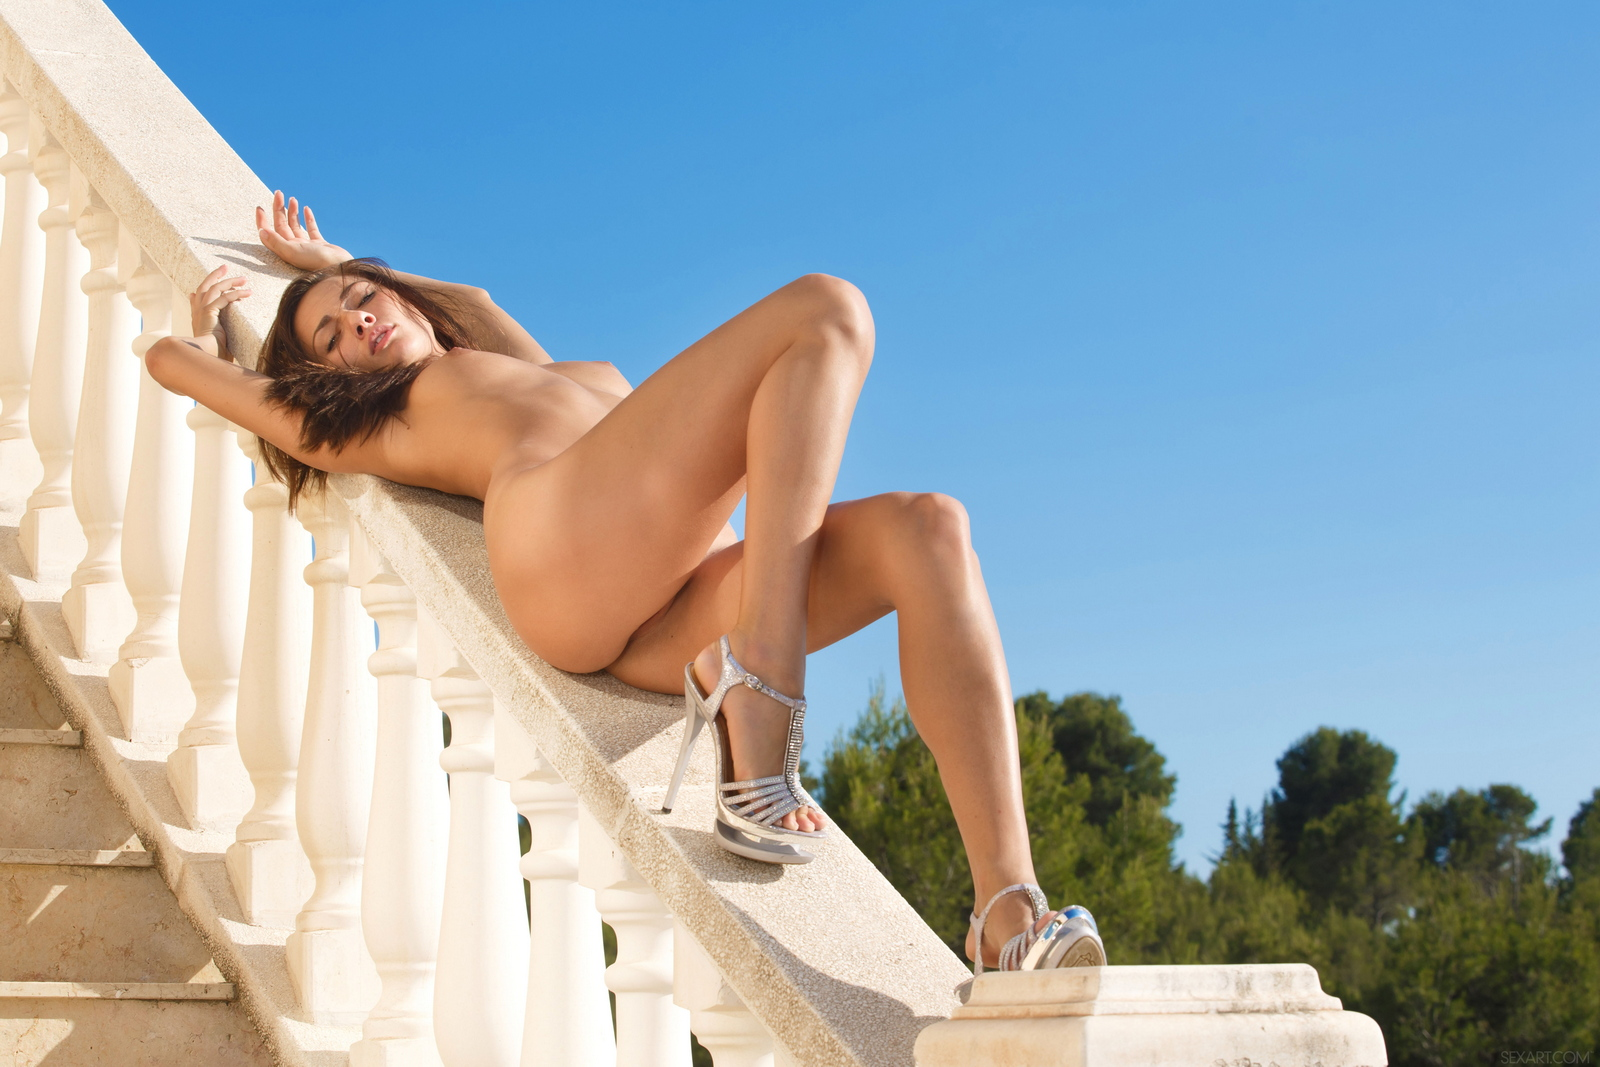 michaela-isizzu-stairs-high-heels-naked-sexart-20